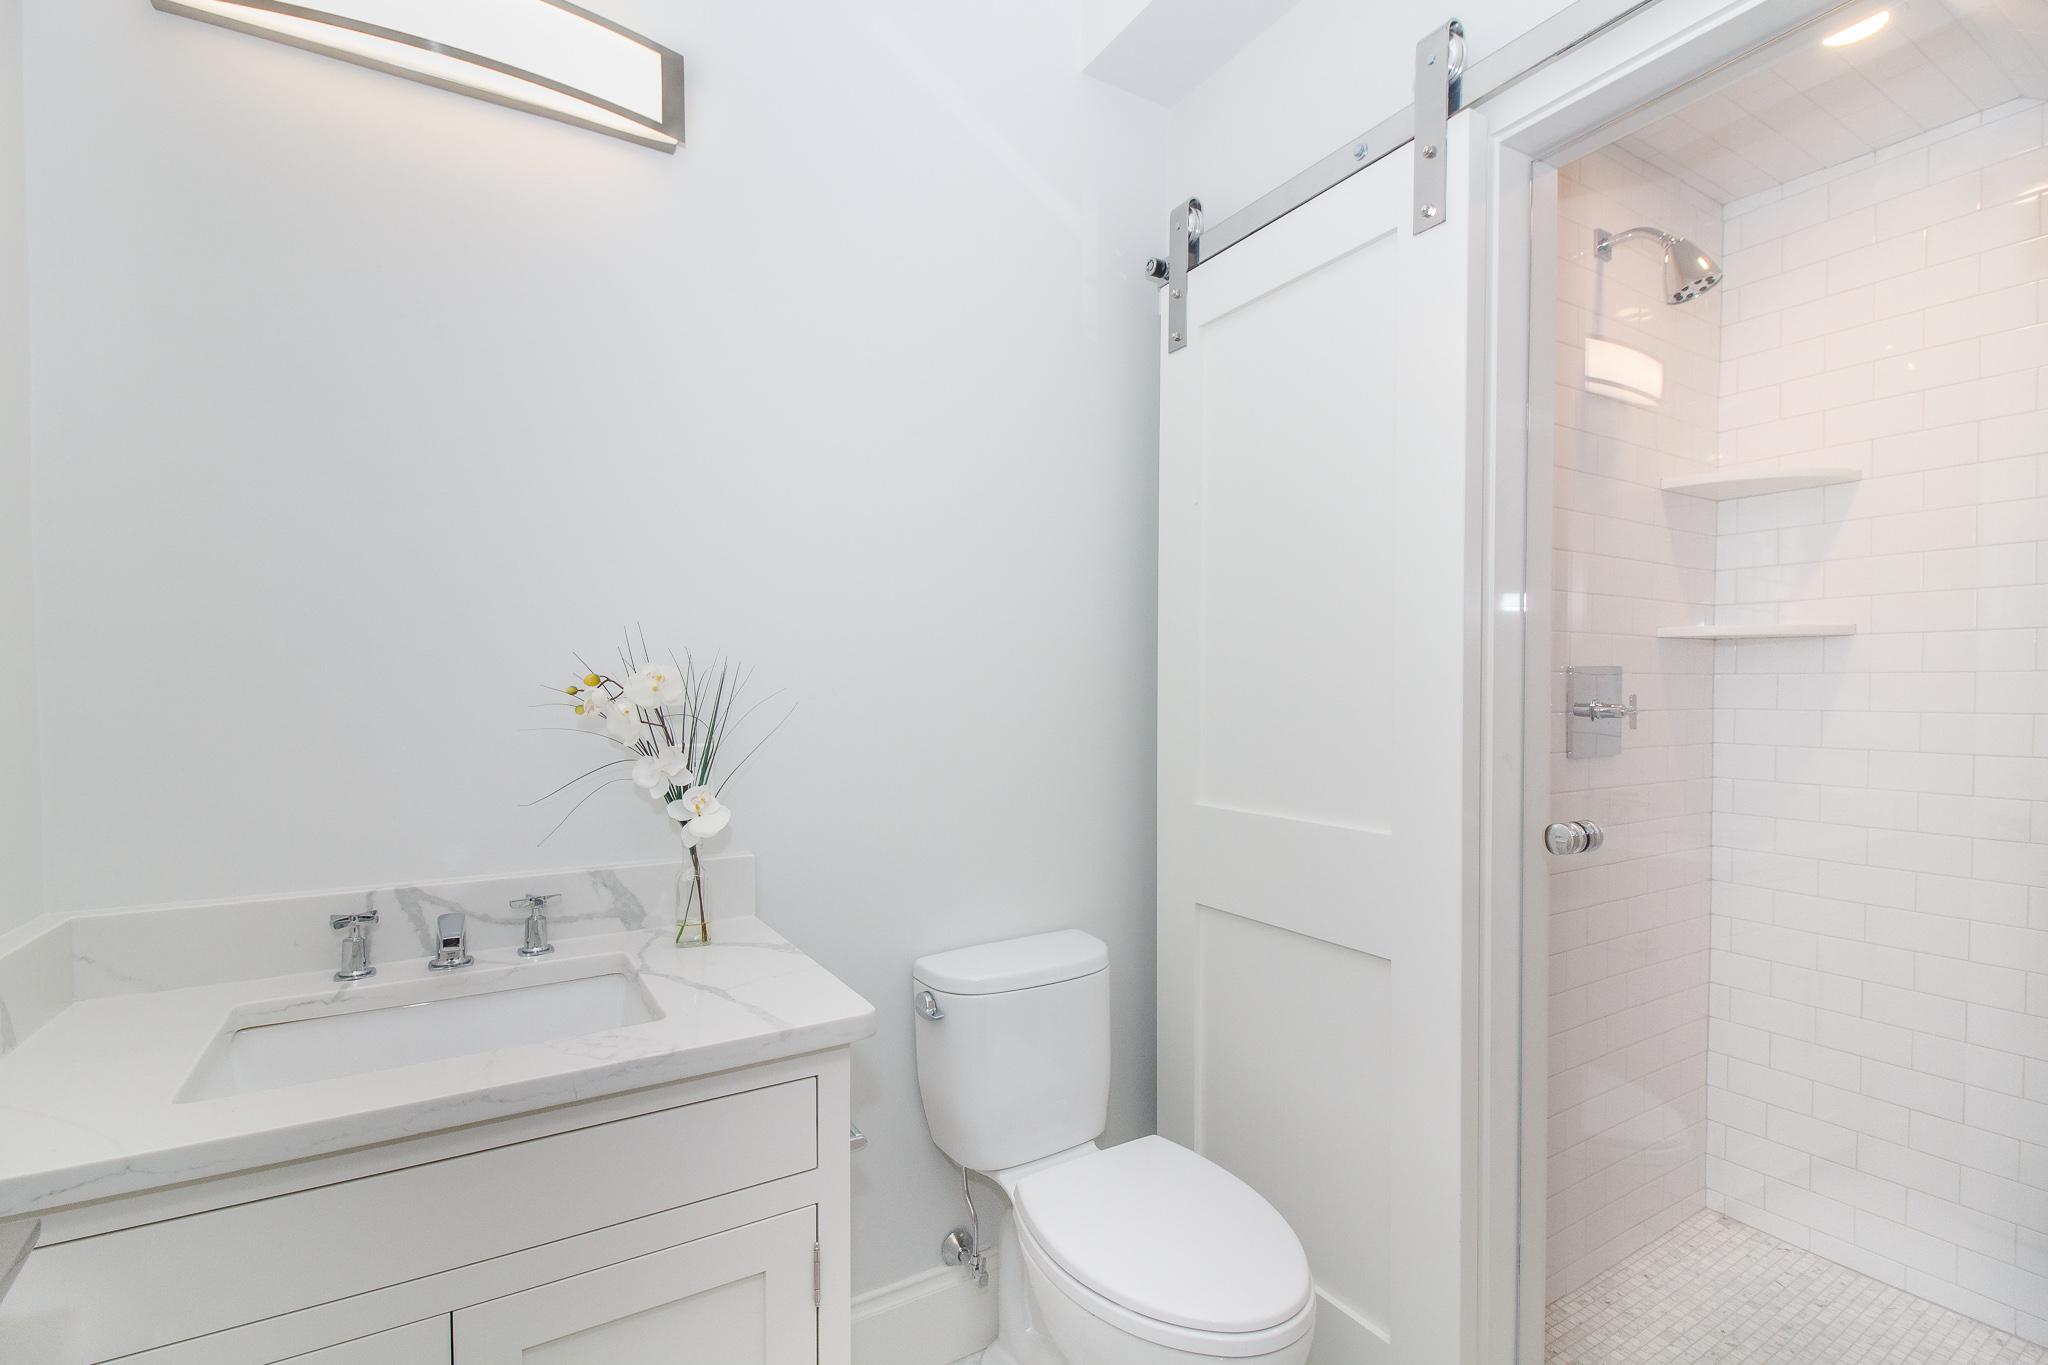 1bathroom1B.jpg